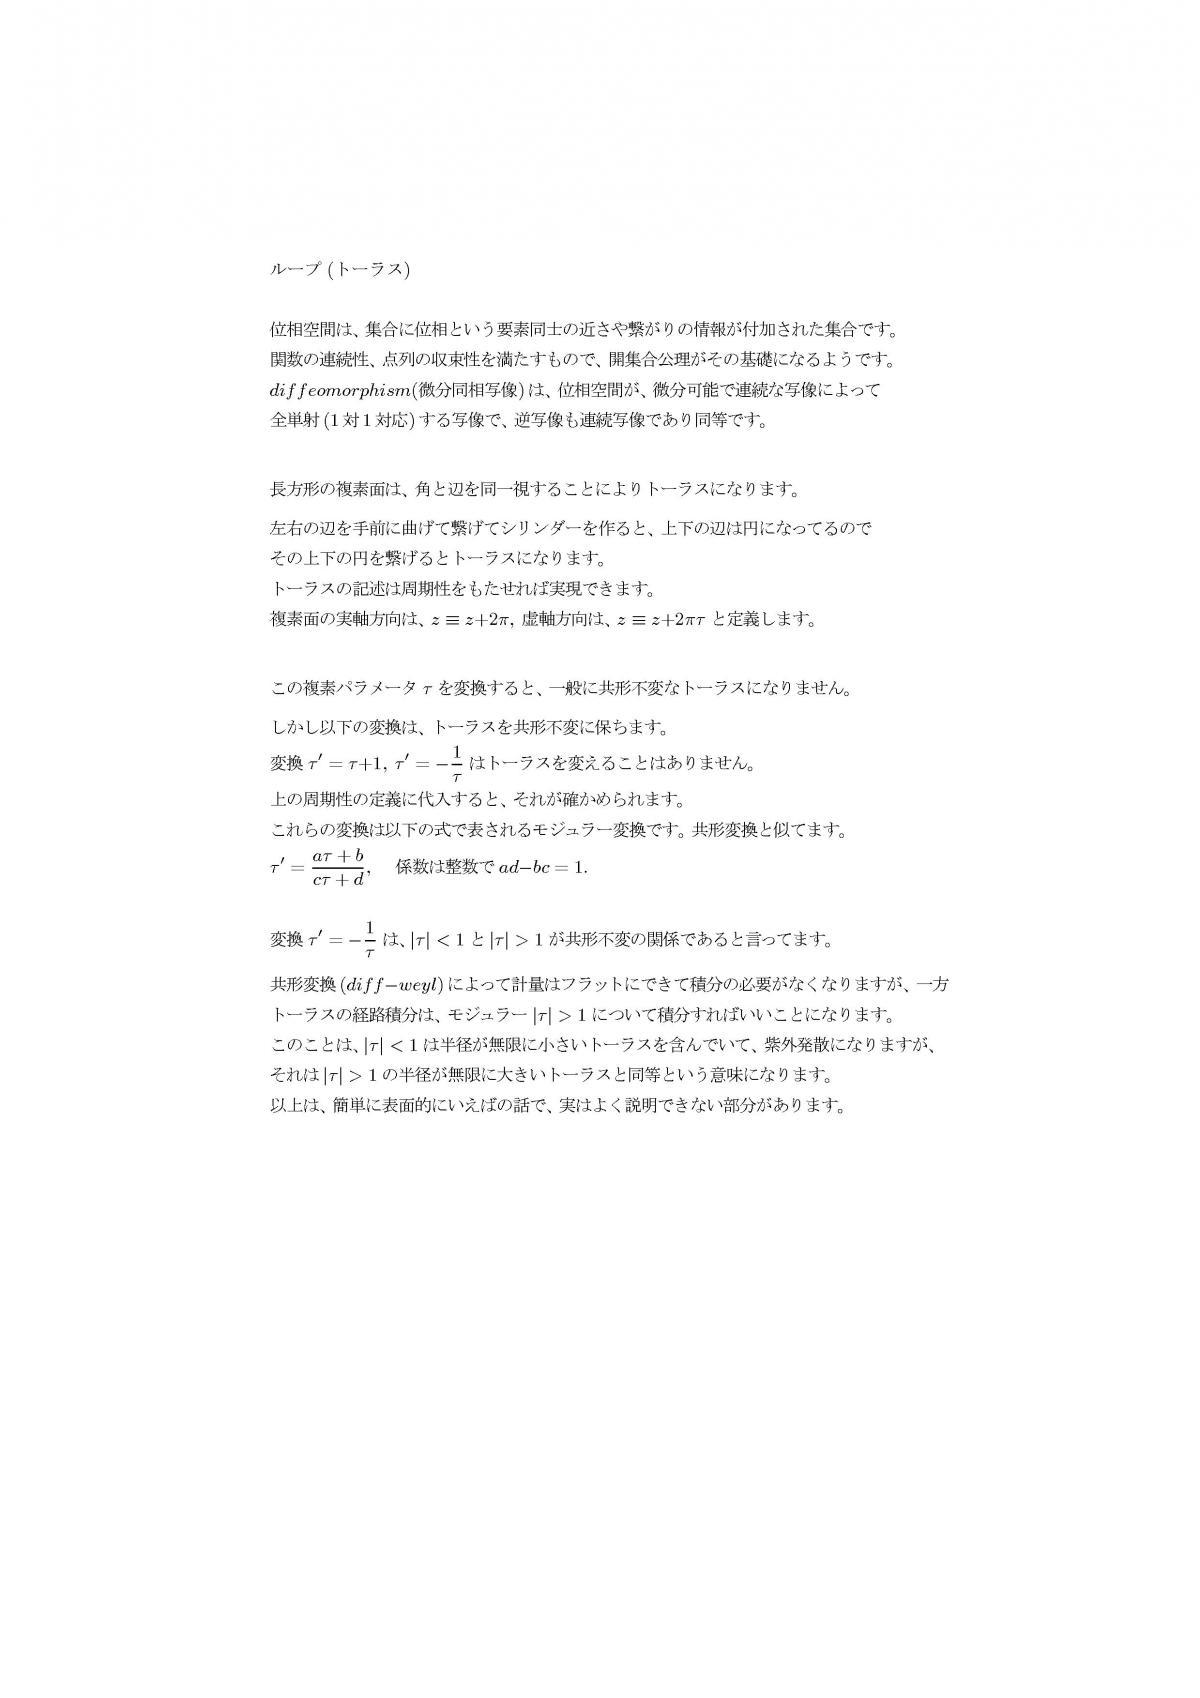 zgen66a.jpg